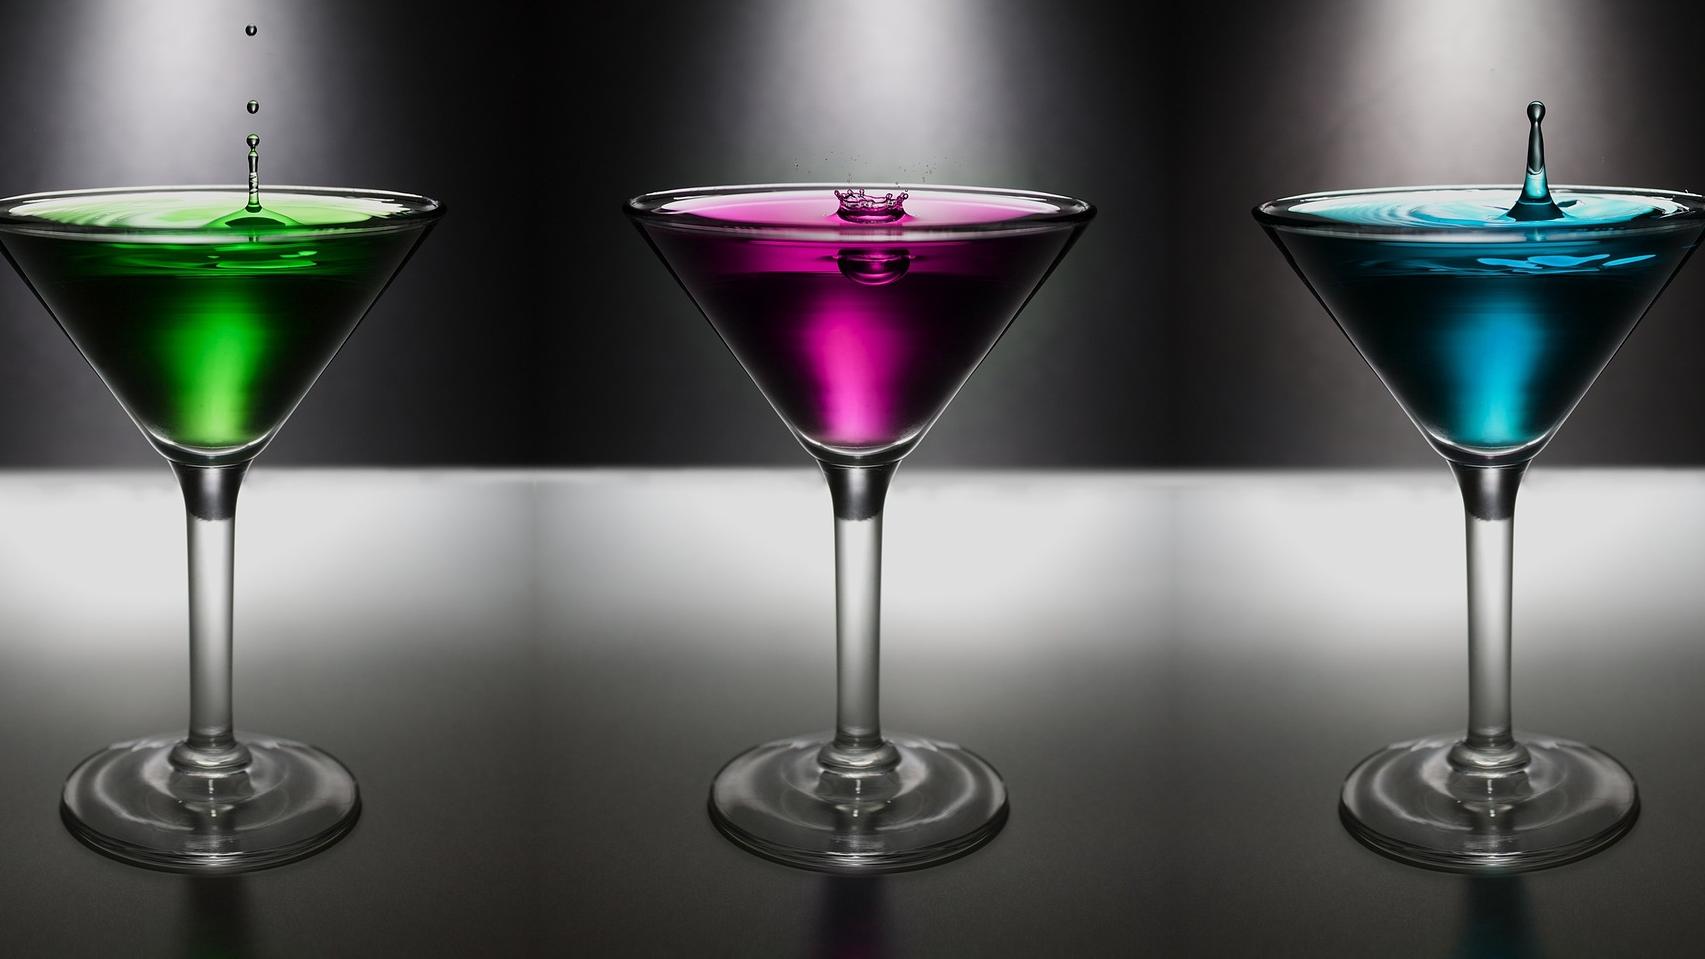 martini-1117932_1920-1524252246.jpg